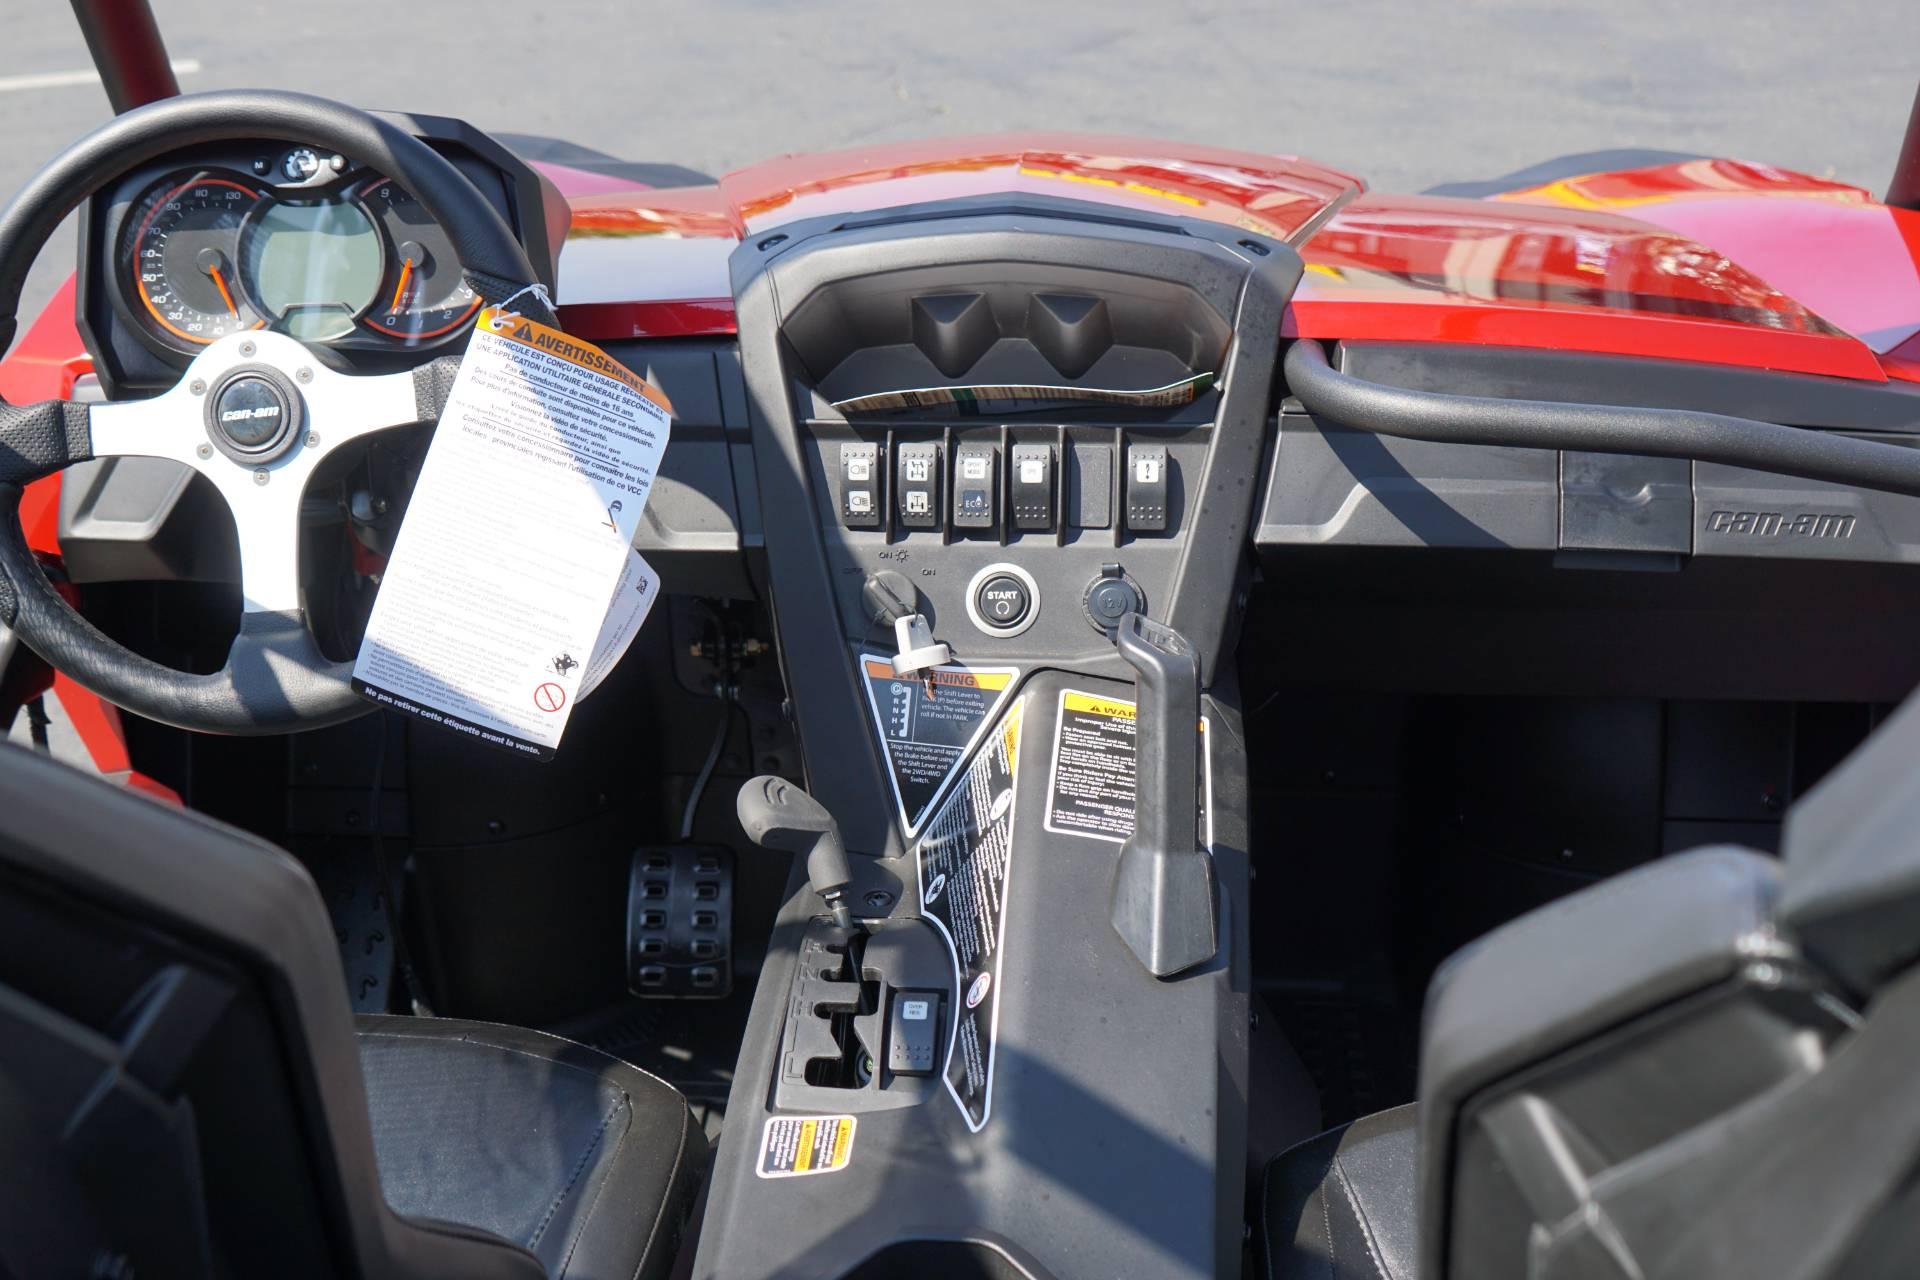 2018 Can-Am™ Commander XT 1000R 12